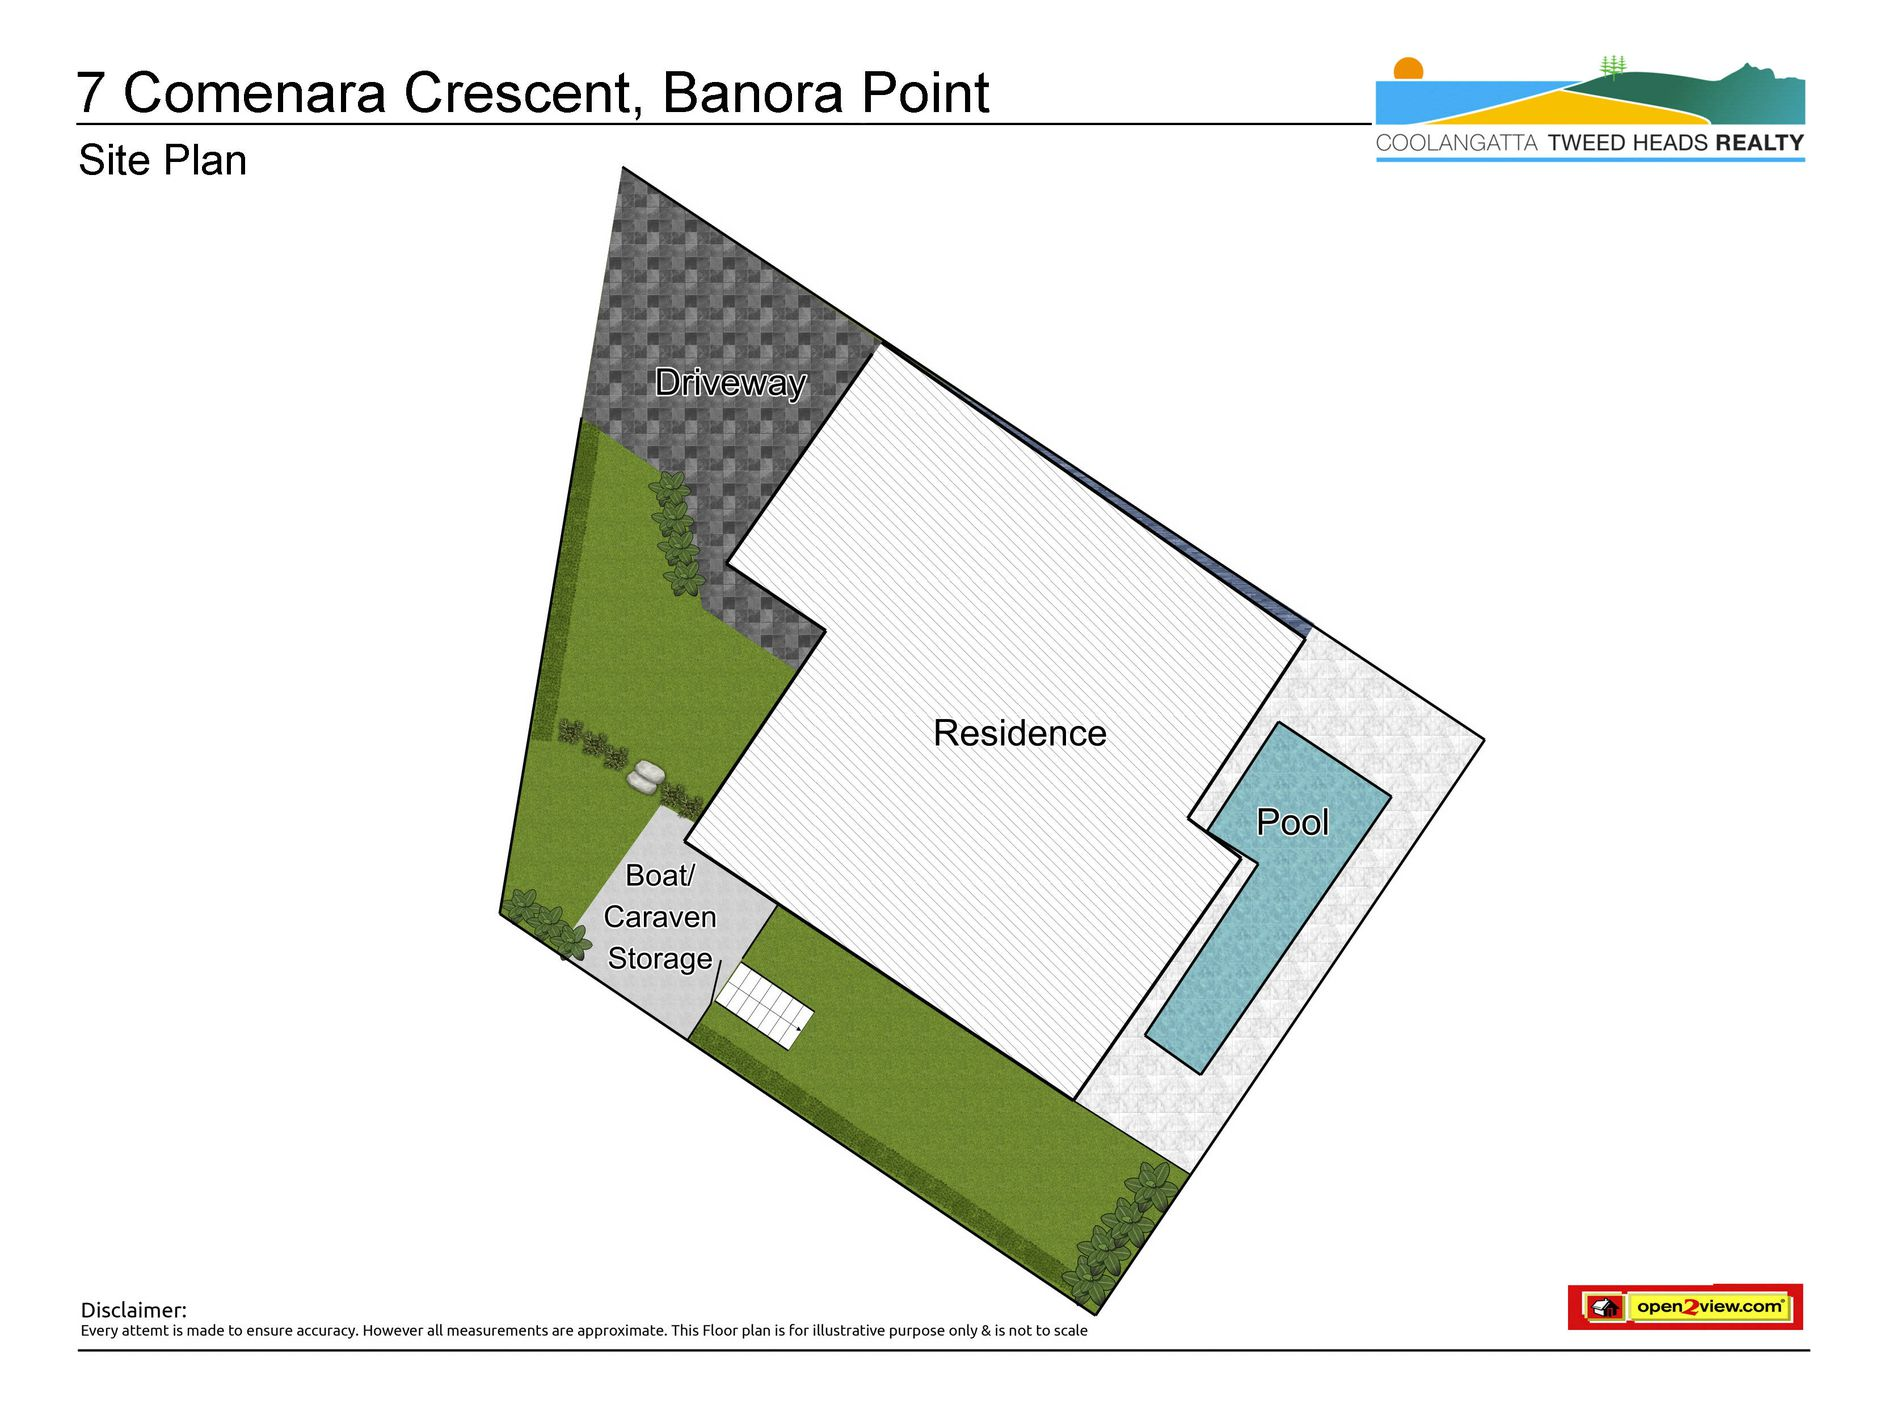 7 Comenara Crescent, Banora Point